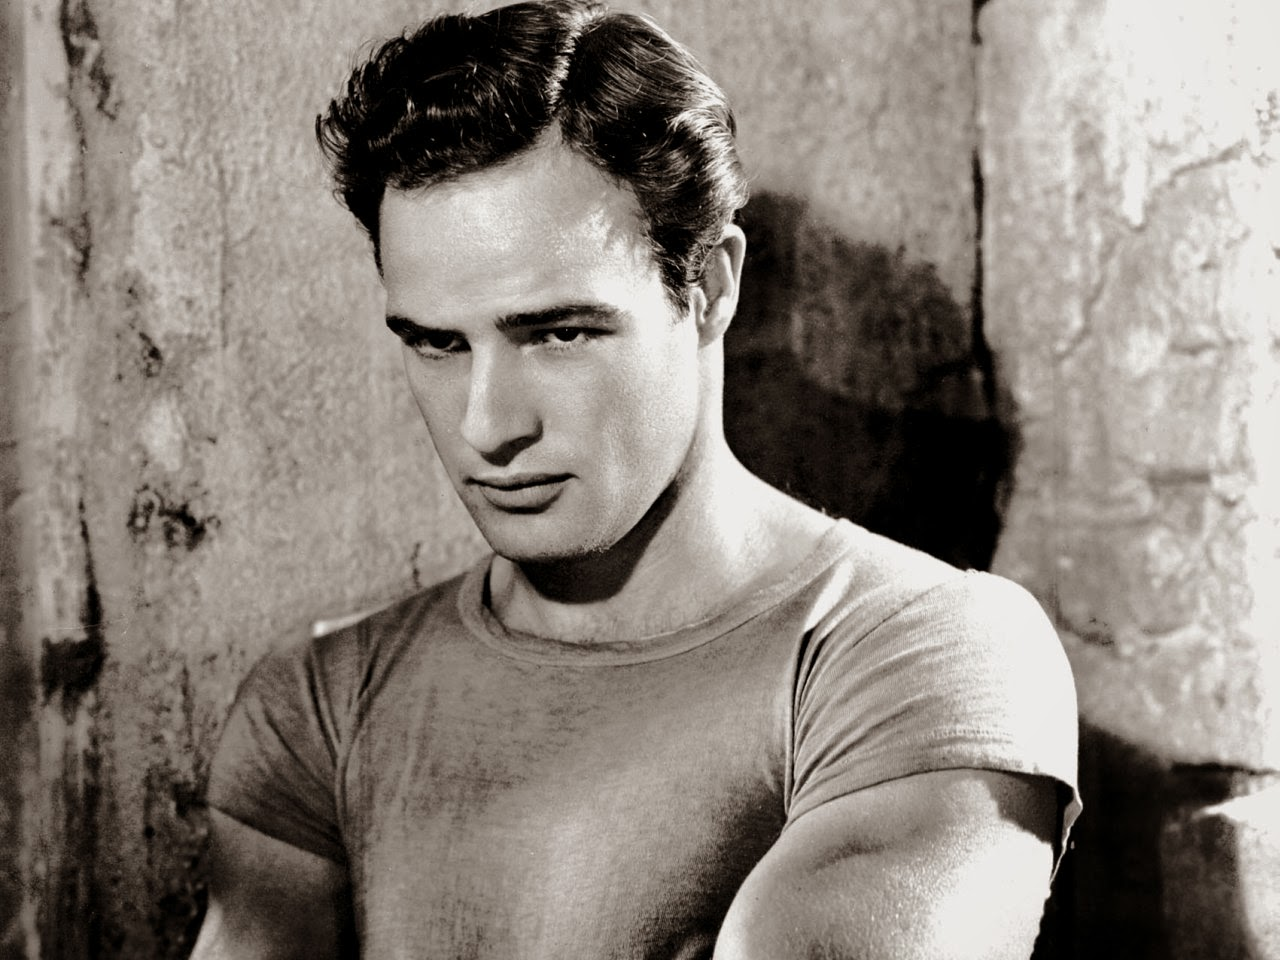 Celeb News Marlon Brando Slept With Richard Pryor, Wife Confirms